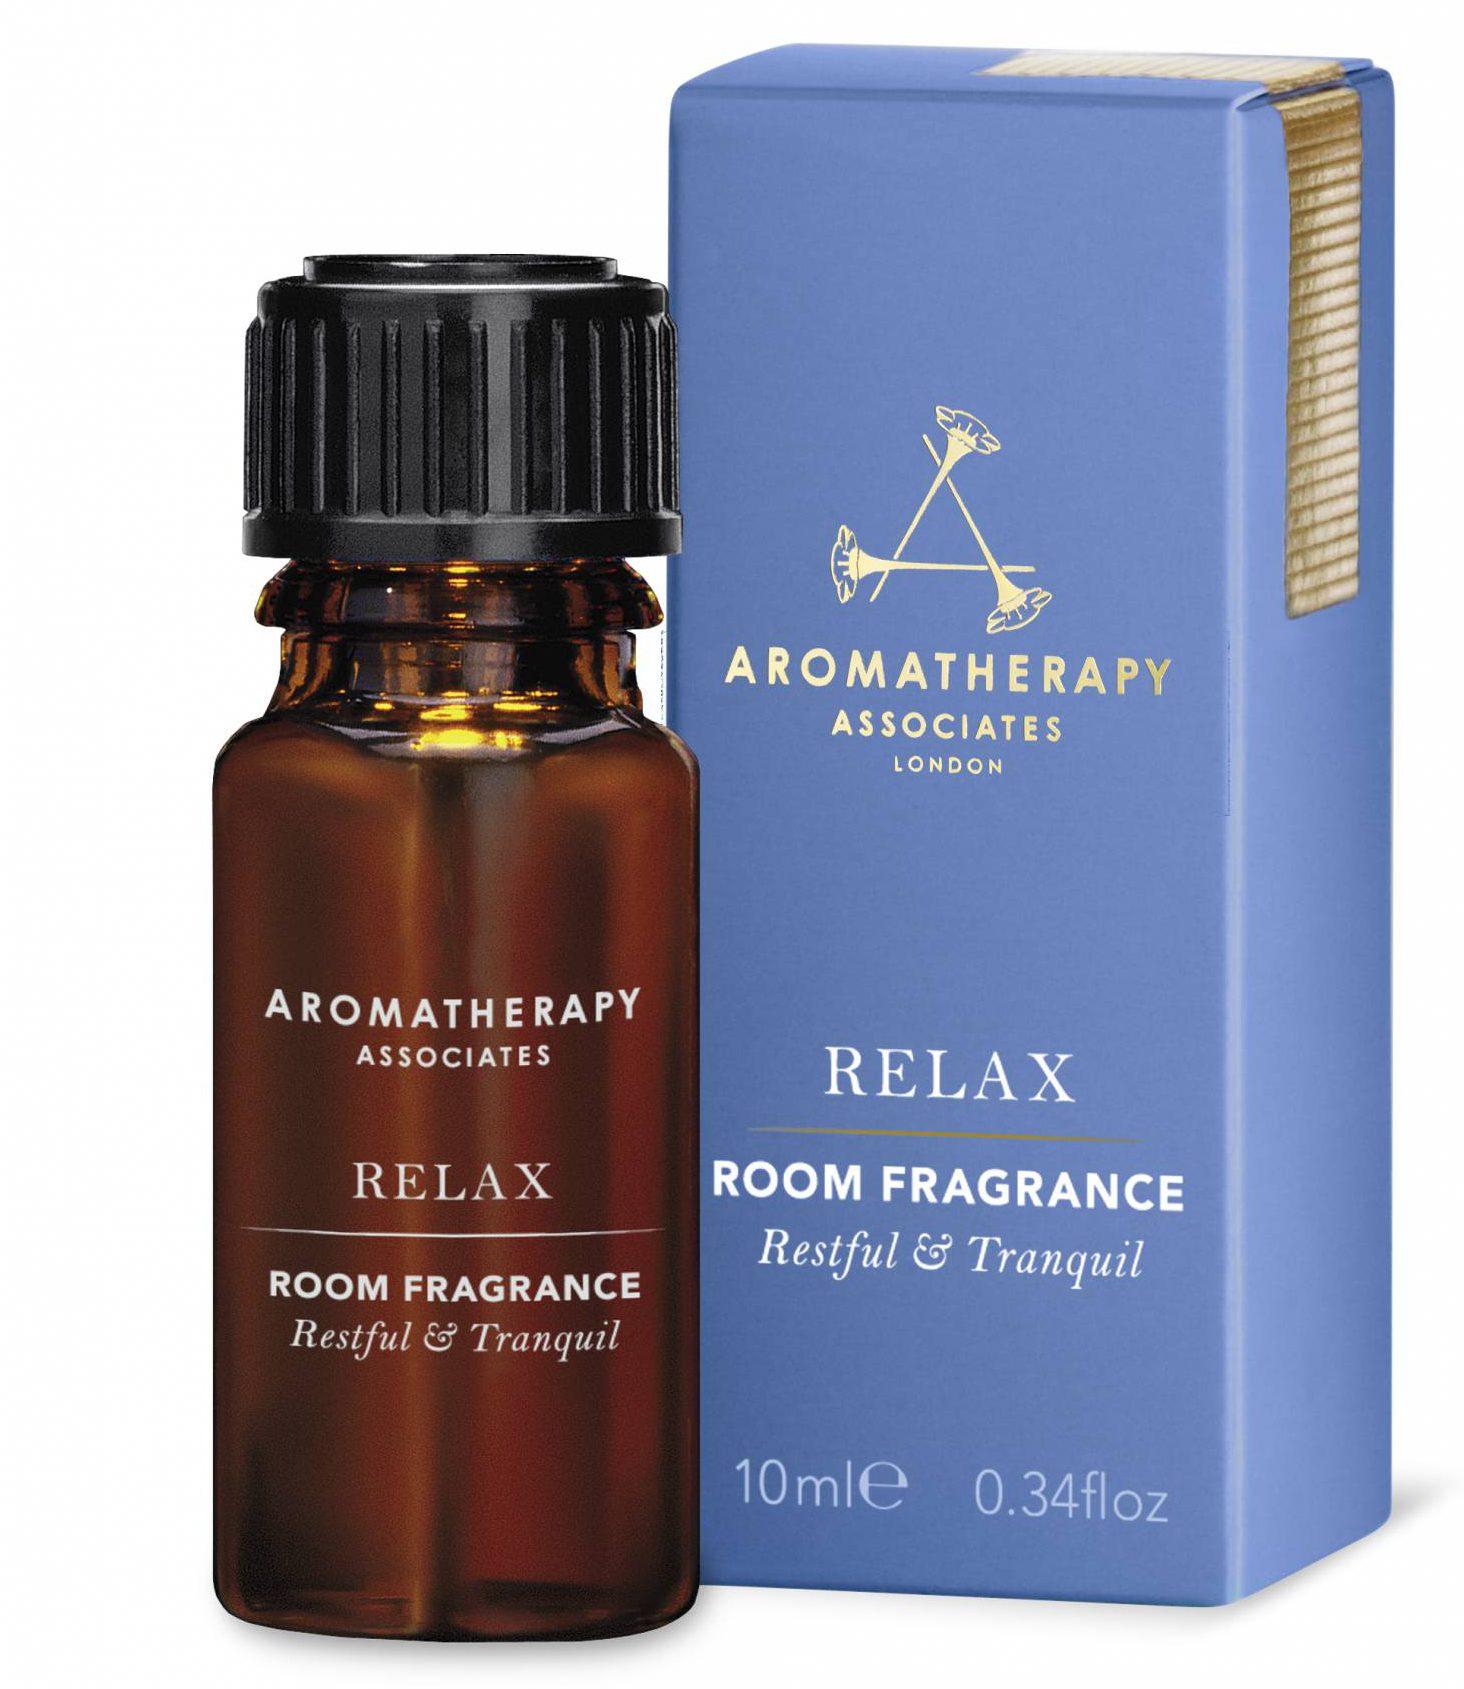 O sile aromaterapii w czasach kwarantanny